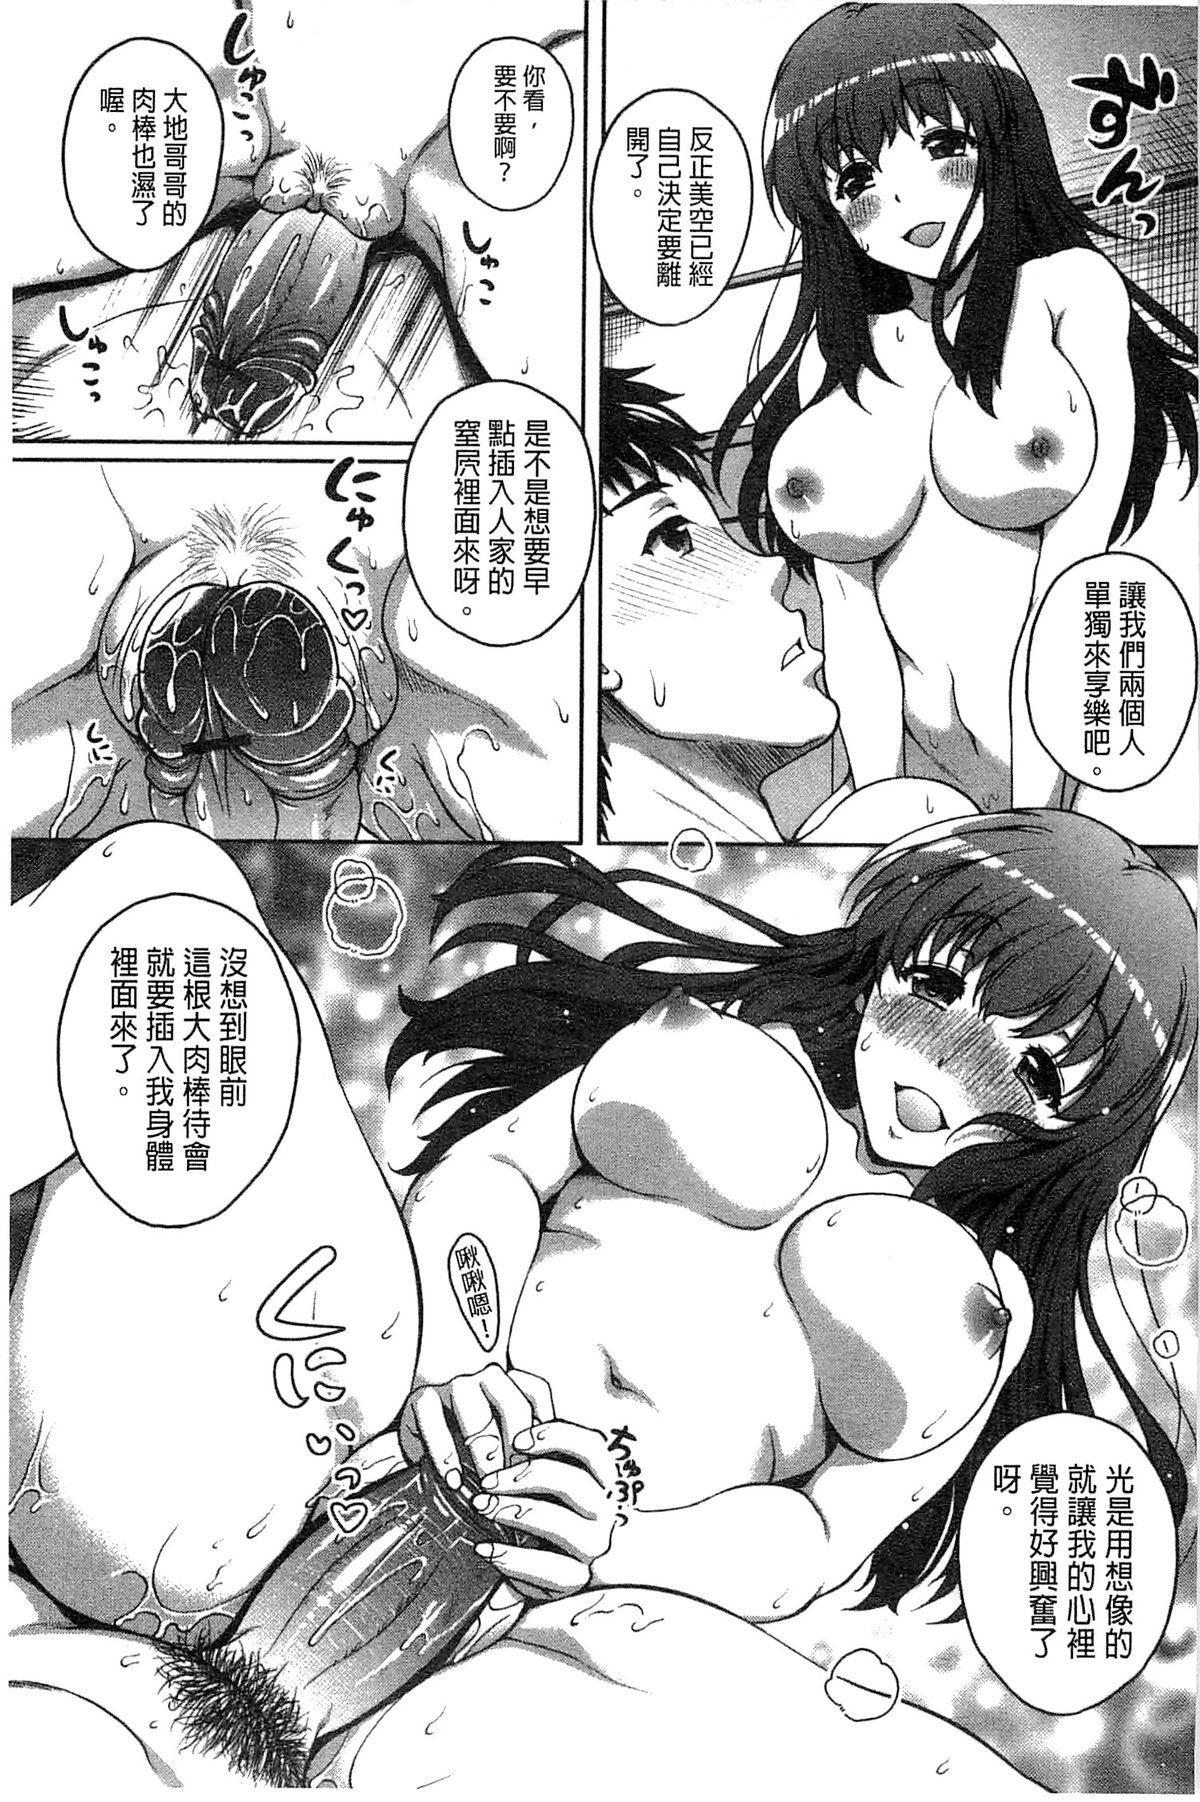 Hajimete nan dakara - First sexual experience 139